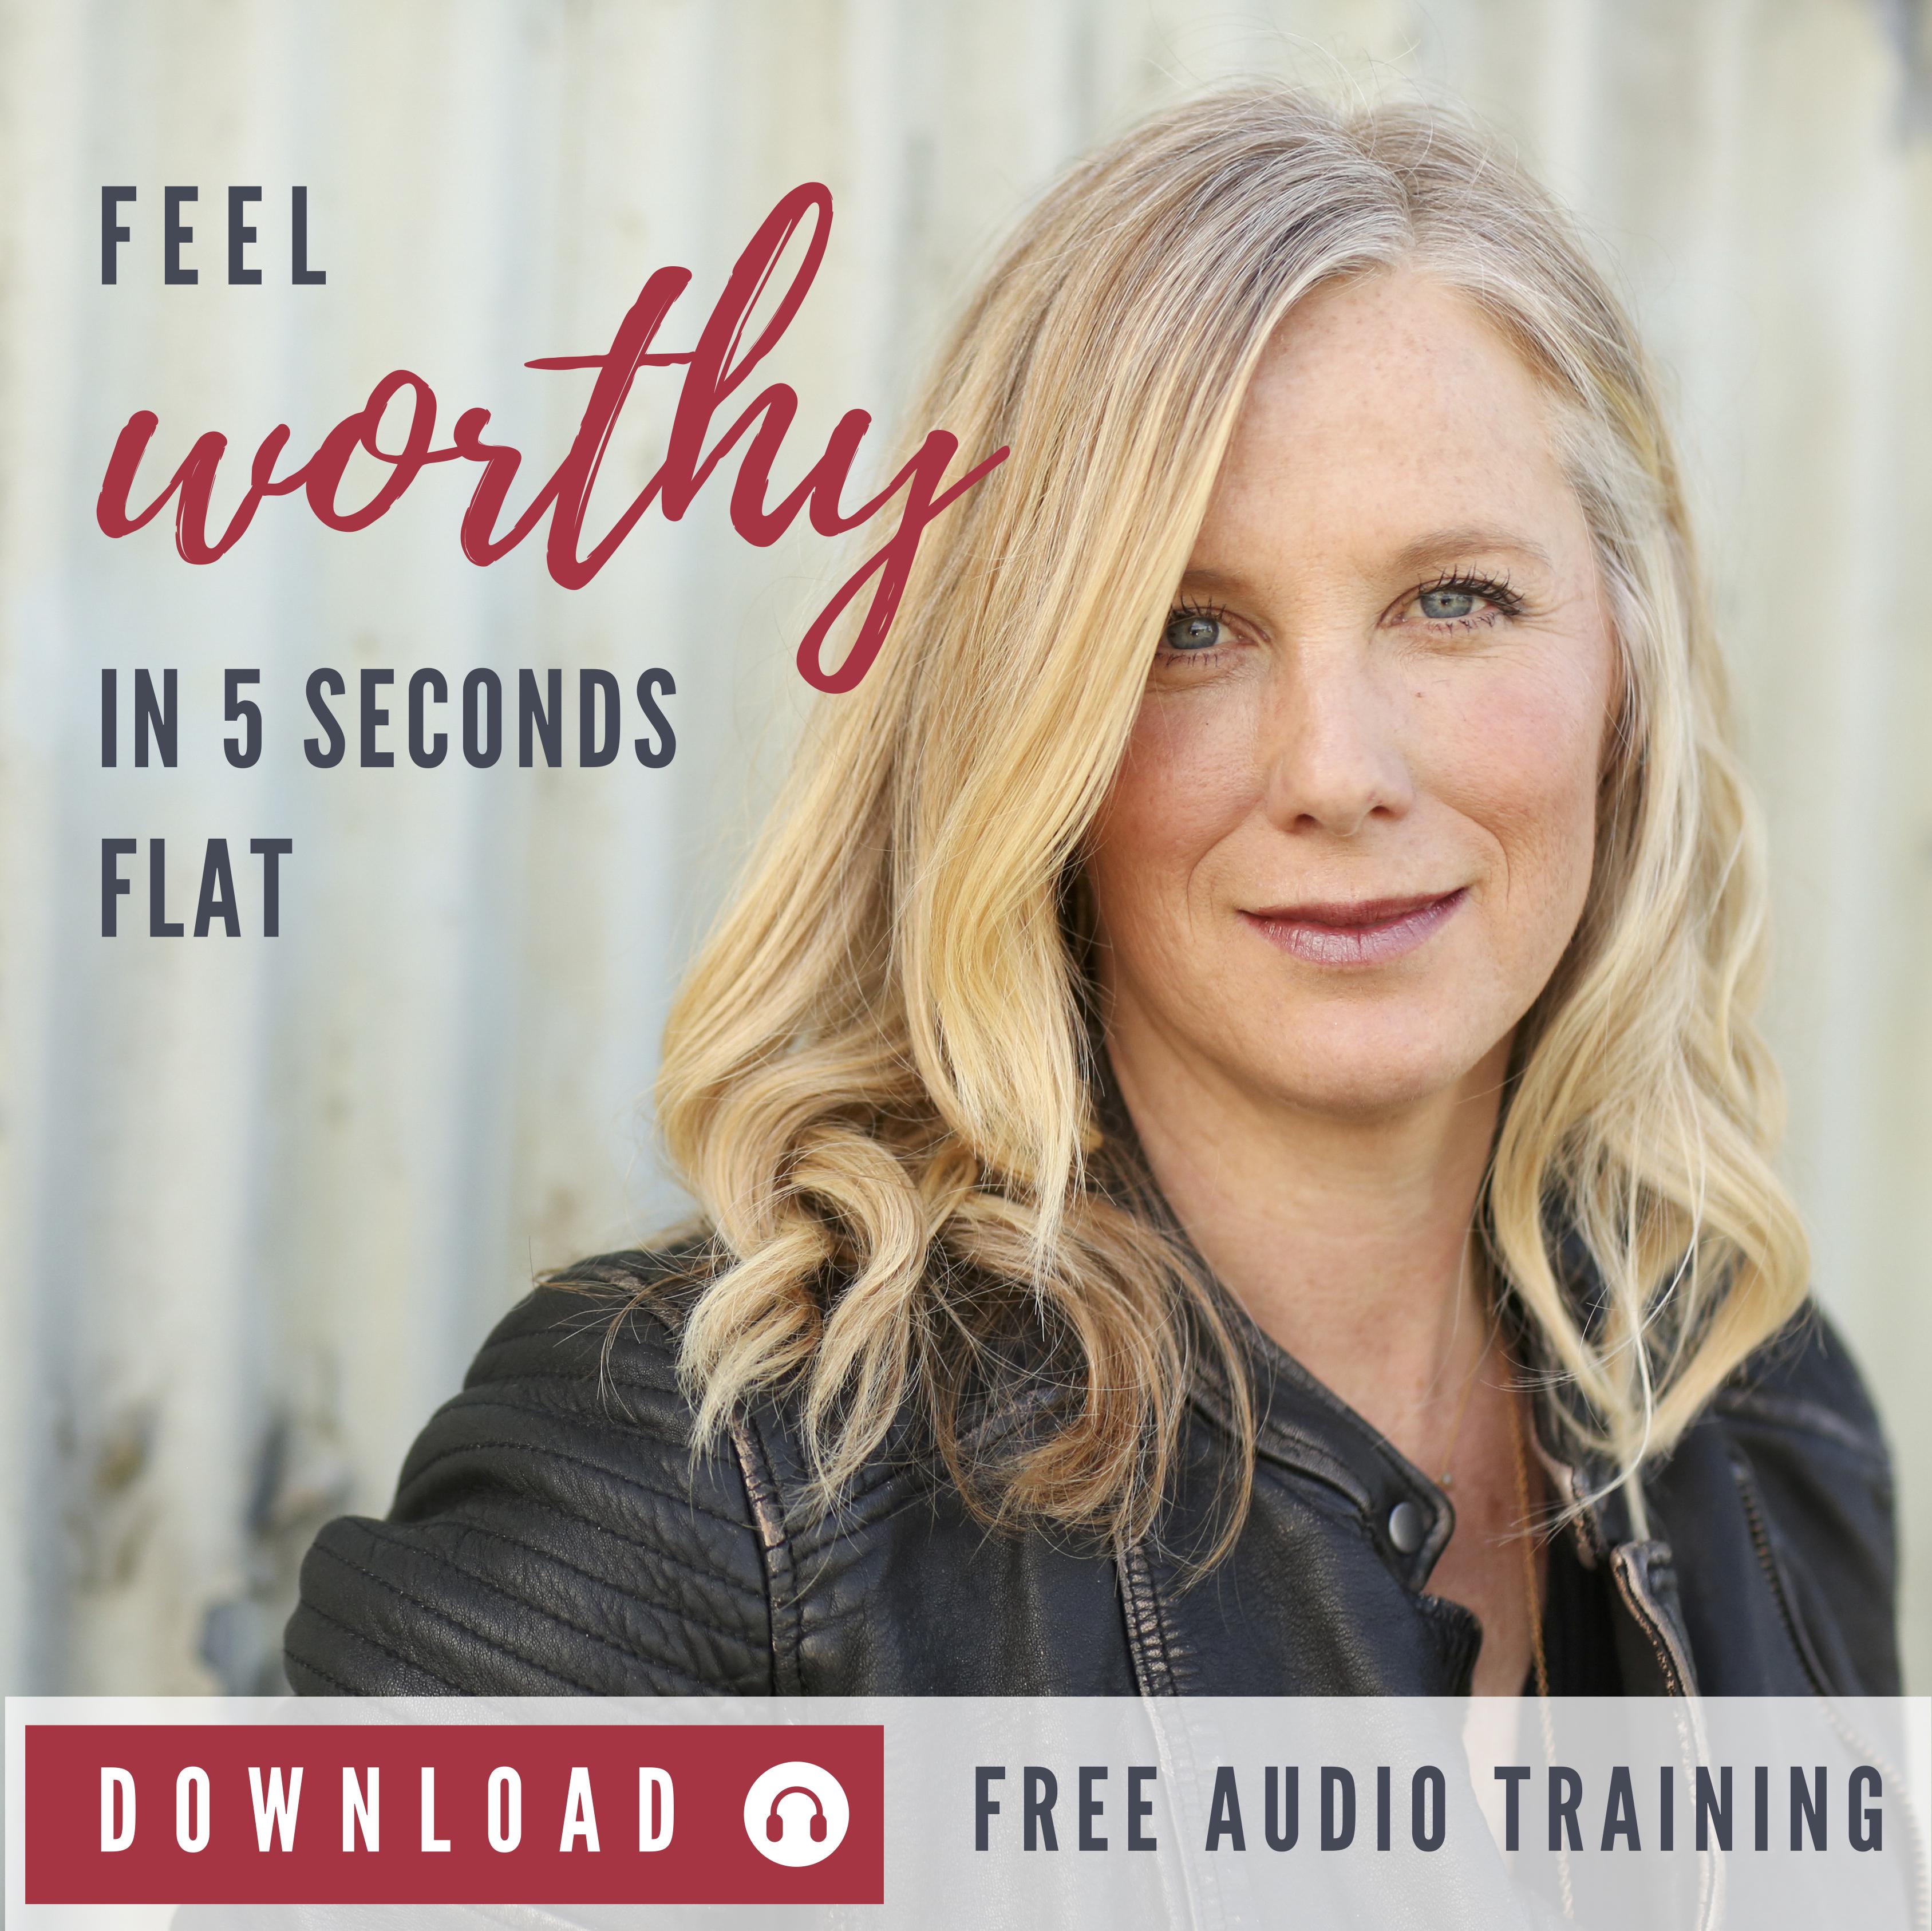 Download Free audio training